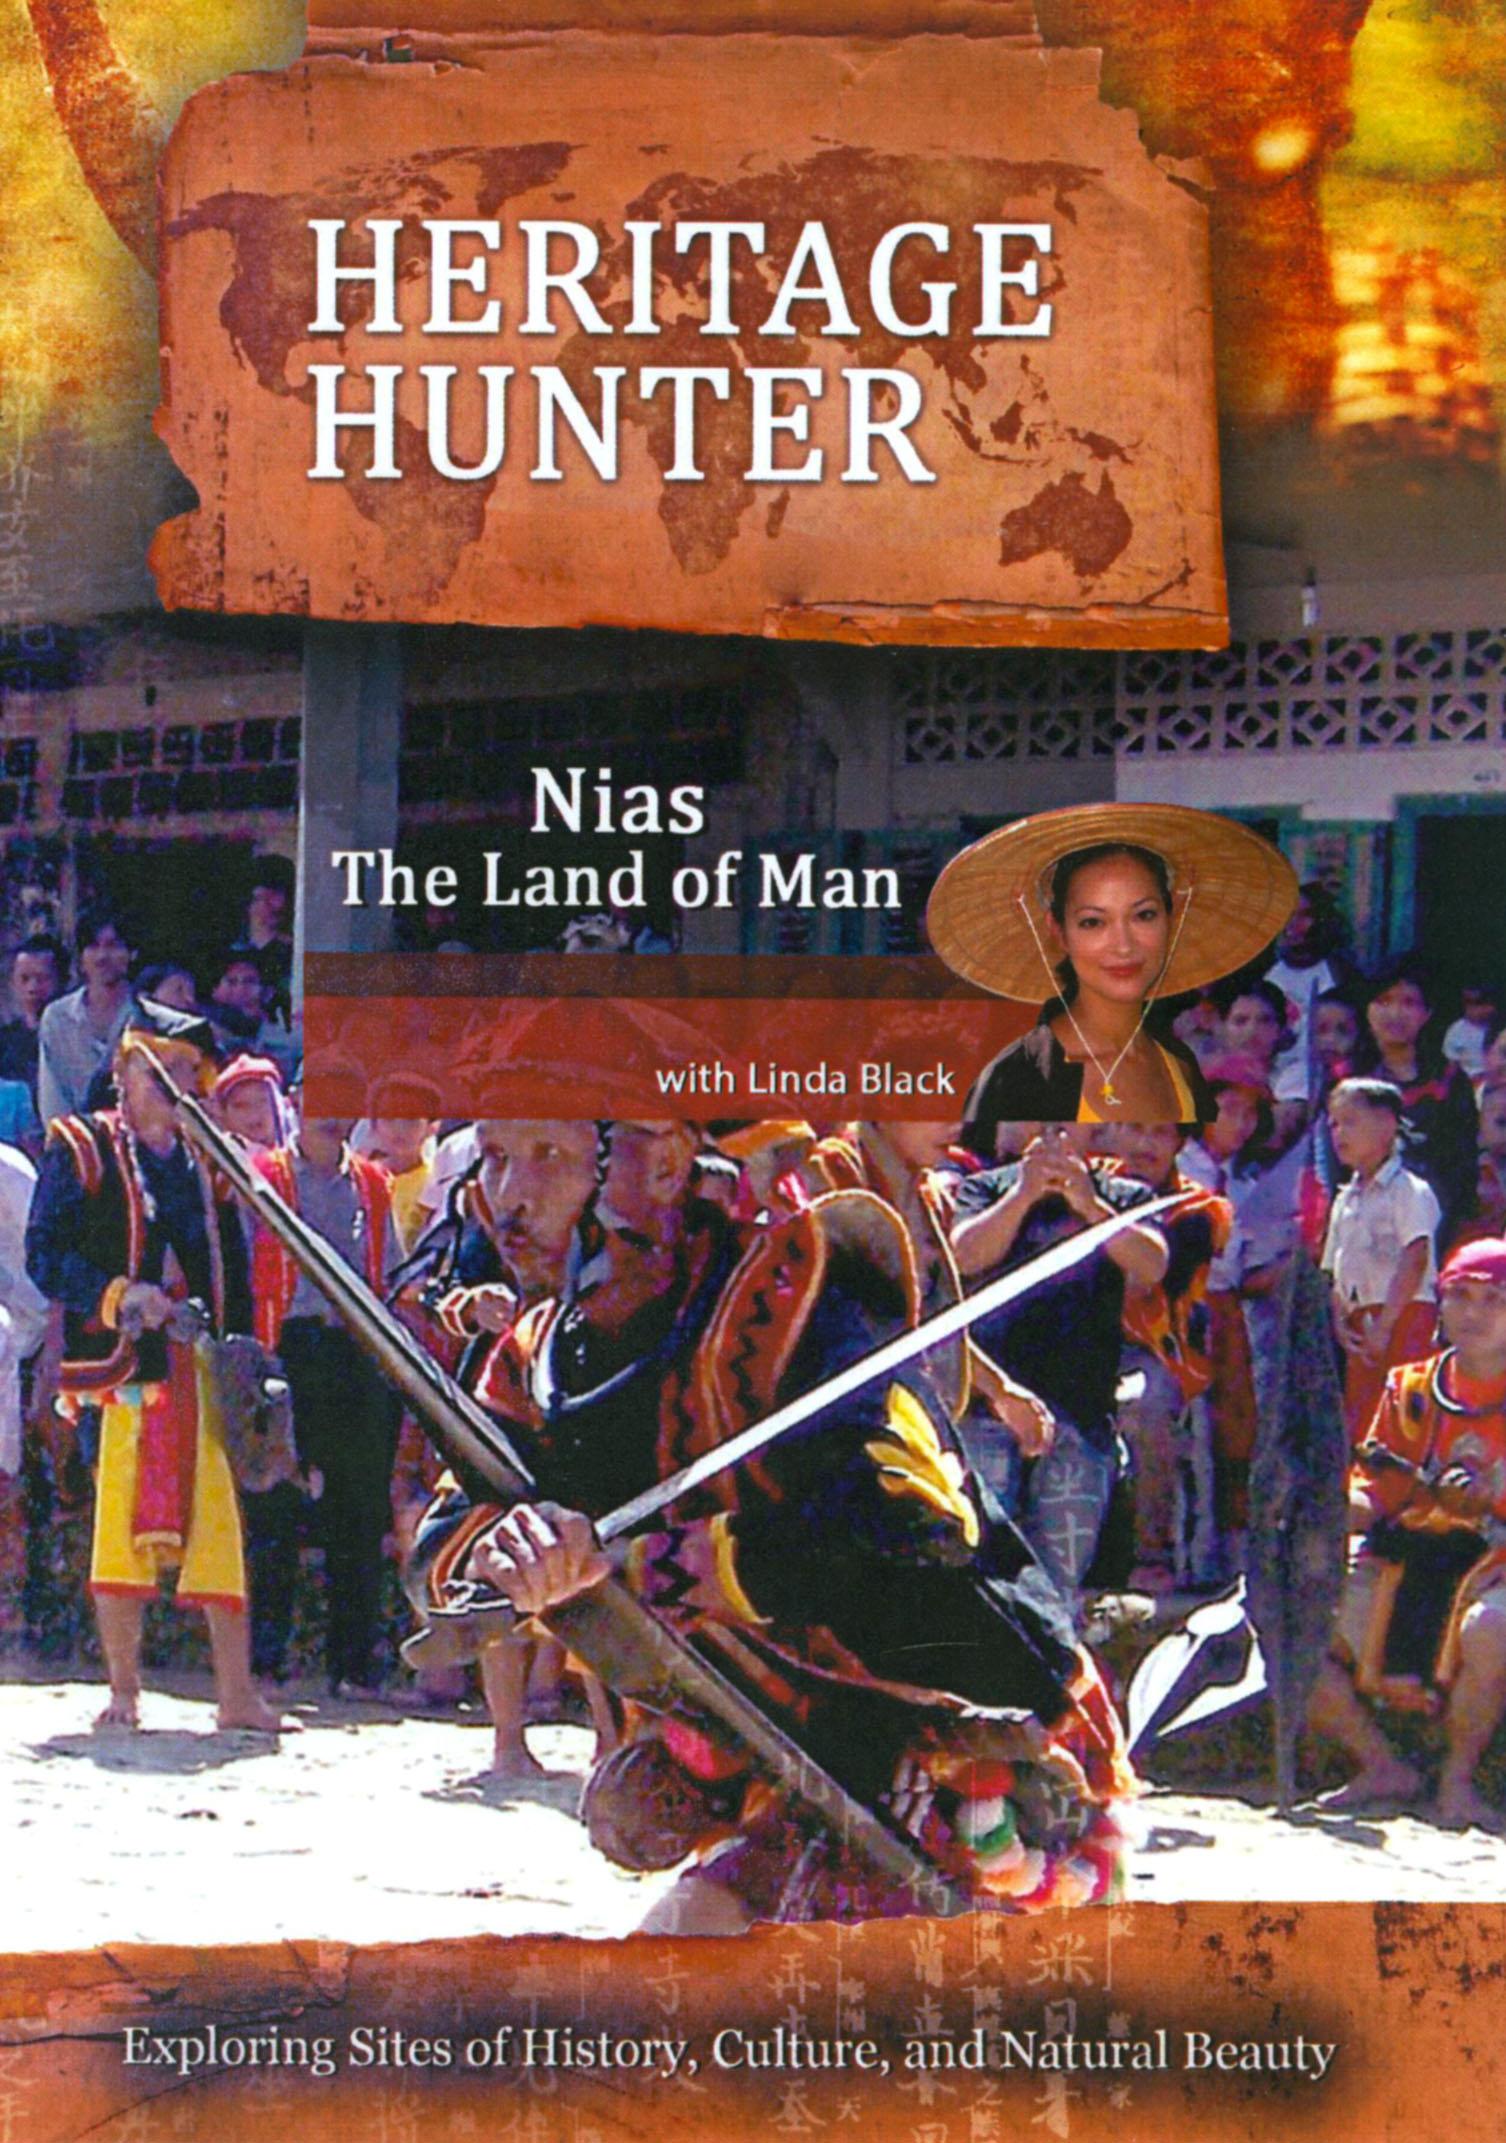 Heritage Hunter: Nias - The Land of Man